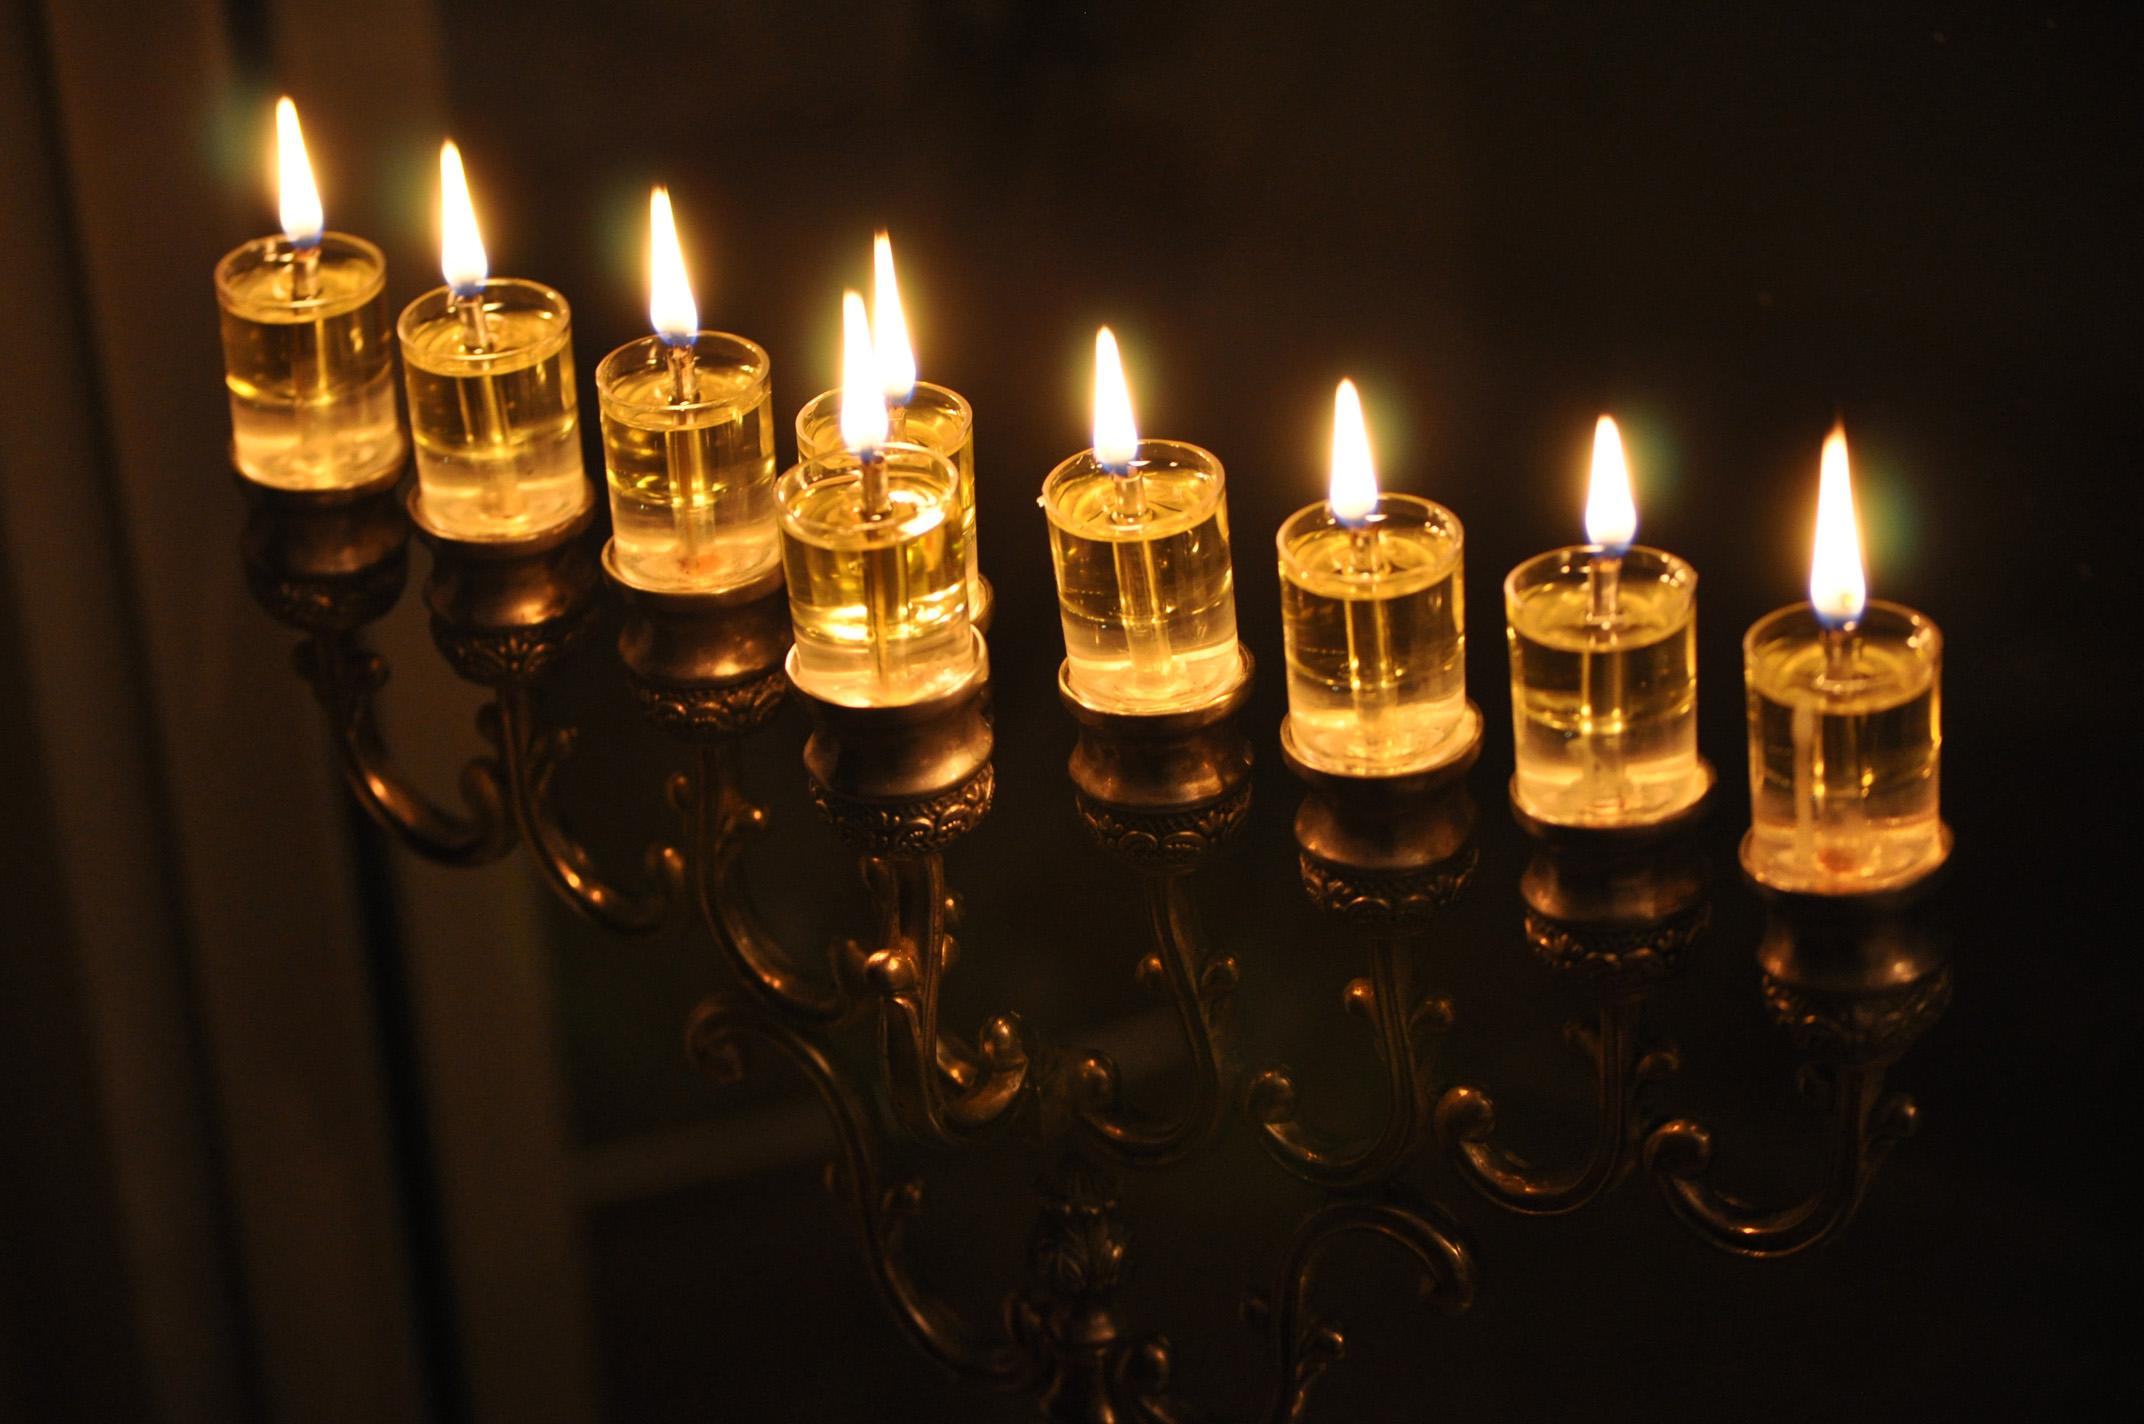 Chanuka – oslava osvobození vrodinném kruhu